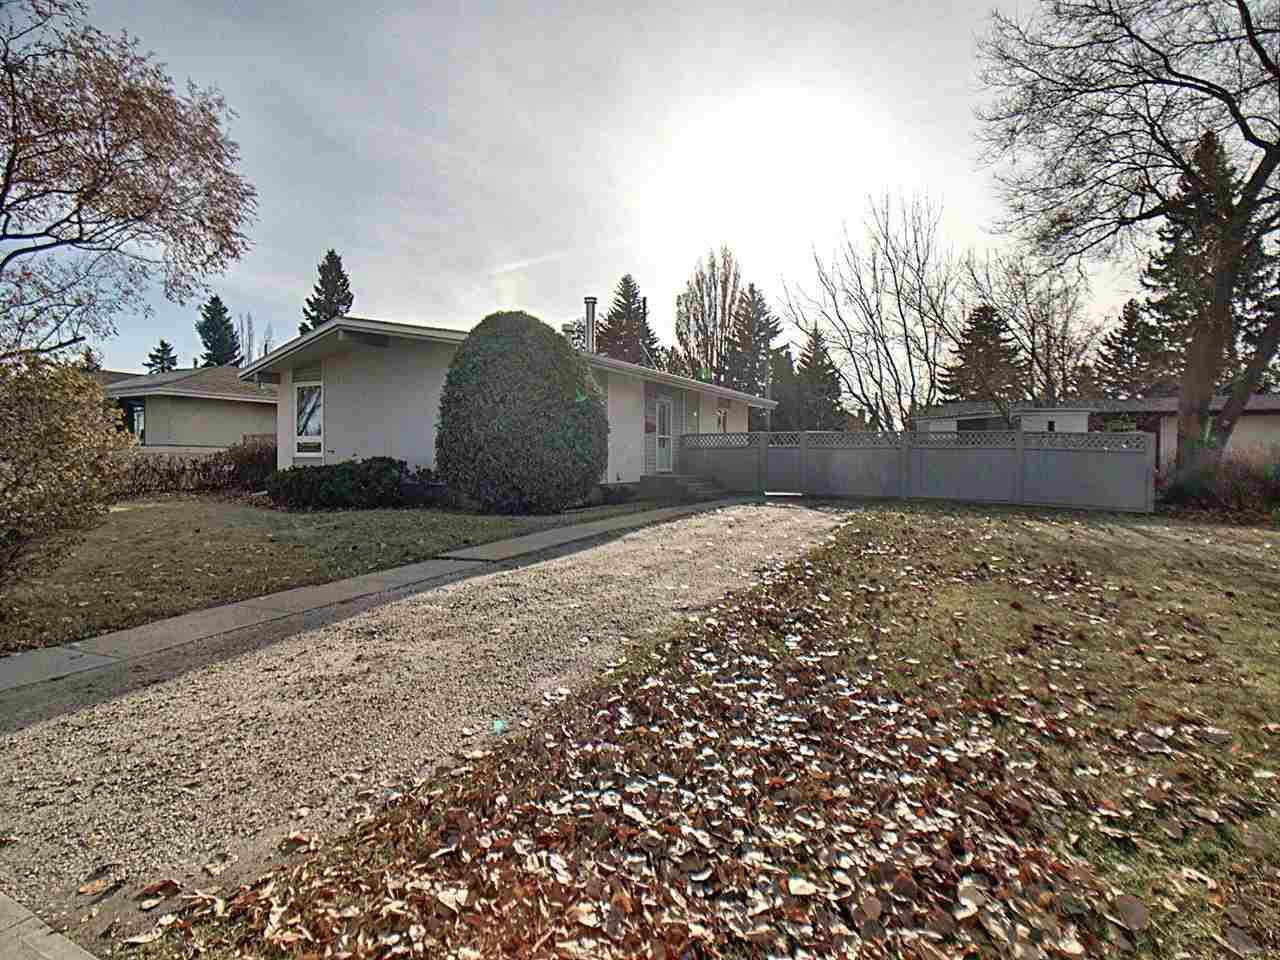 Main Photo: 15421 76 Avenue in Edmonton: Zone 22 House for sale : MLS®# E4193288